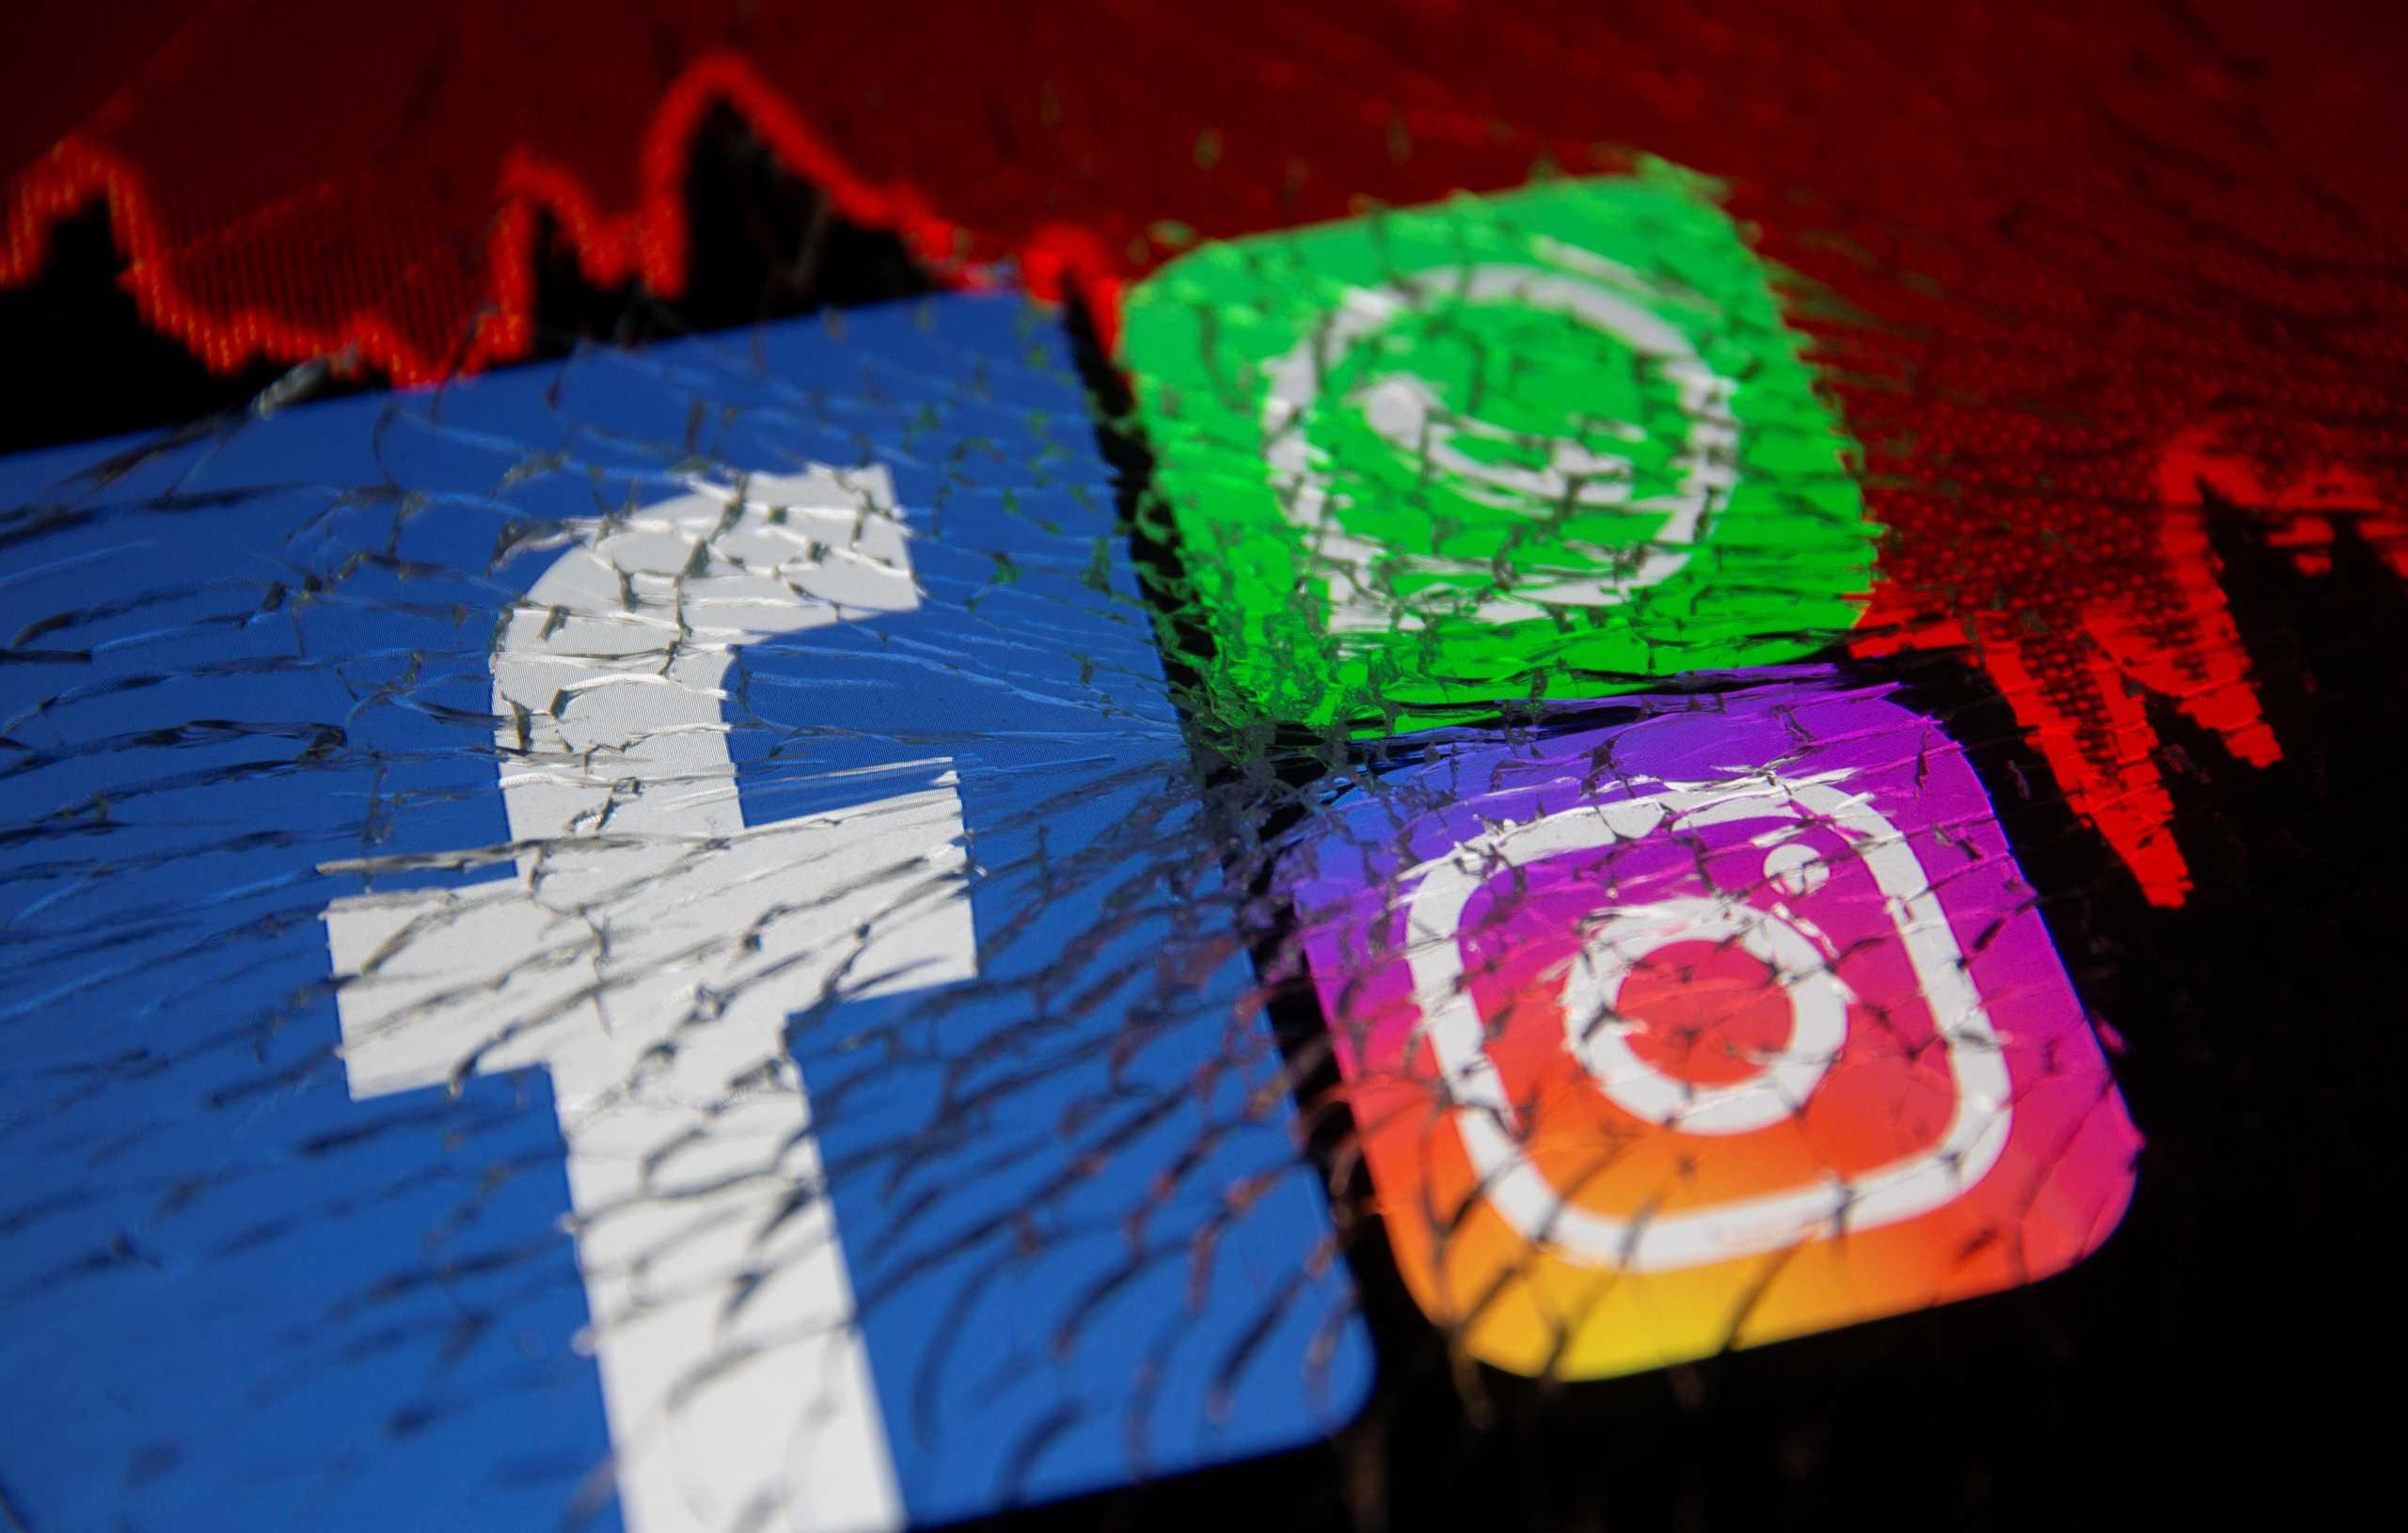 Facebook – Instagram: Οι 7 ώρες που απέδειξαν την εξάρτησή μας από τα social media – Ποιοι επωφελήθηκαν